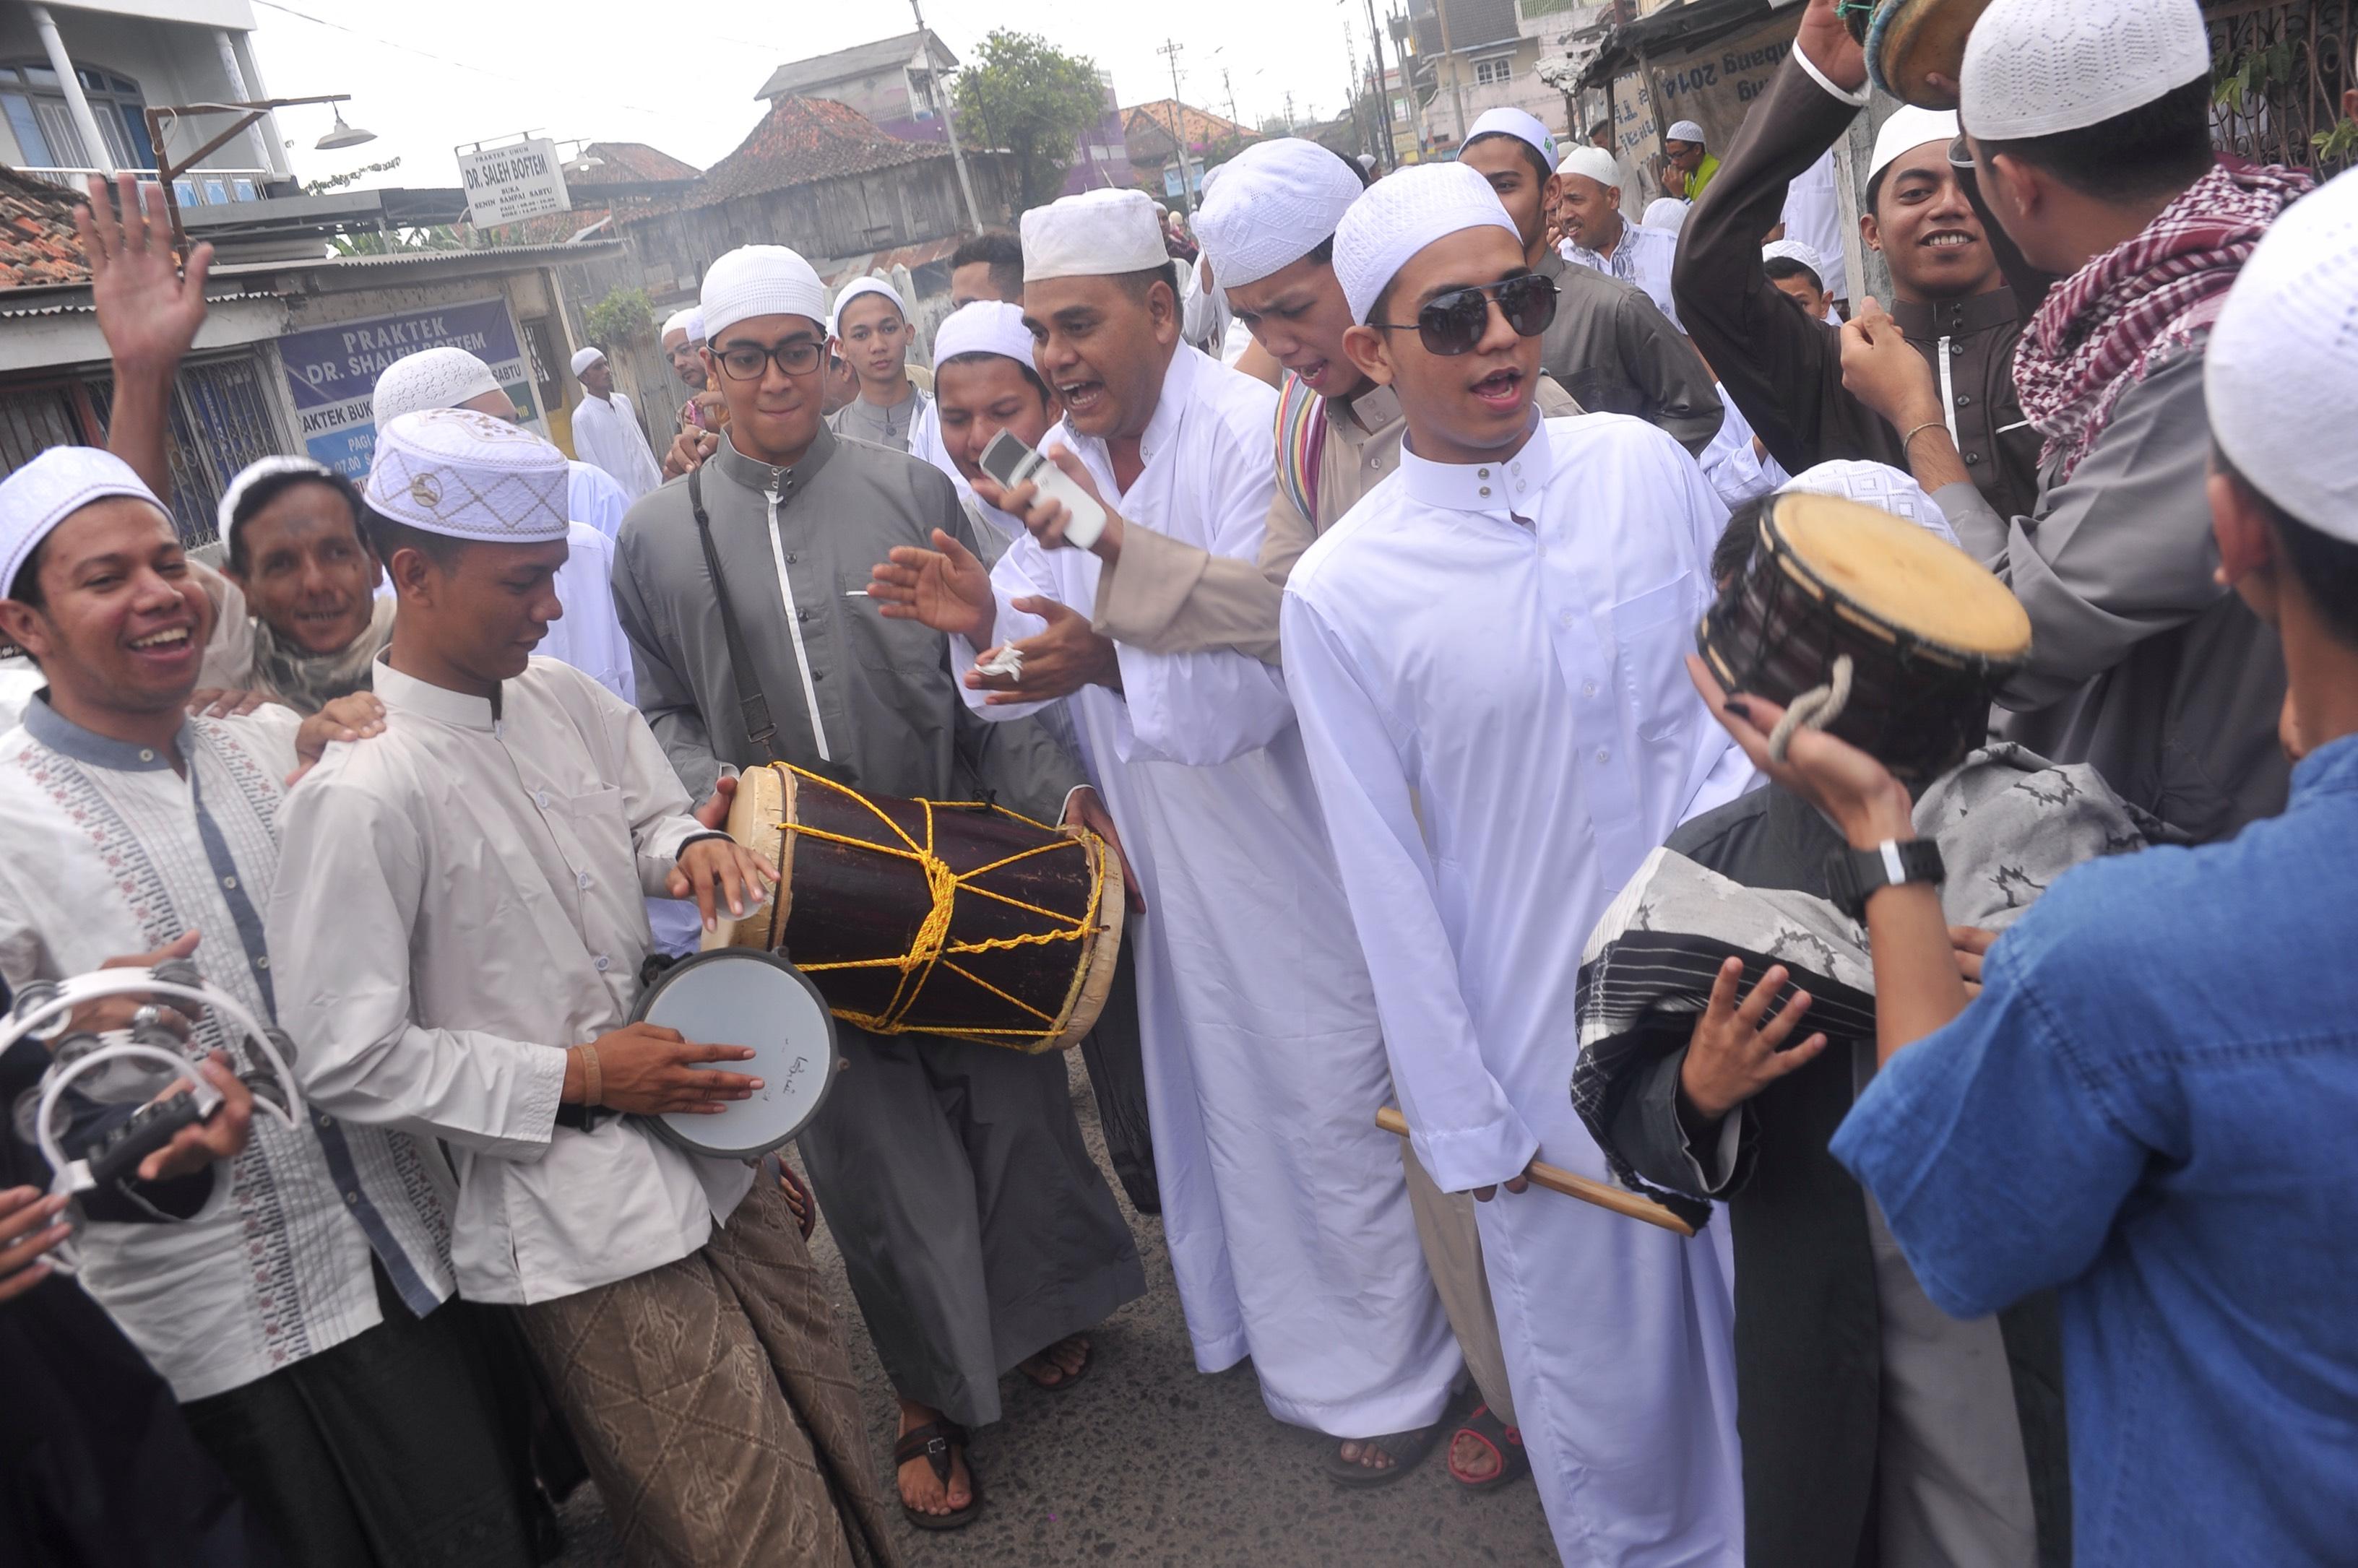 Tradisi Rumpak Rumpakan Palembang Sumsel Berita Daerah Kampung Arab Kota